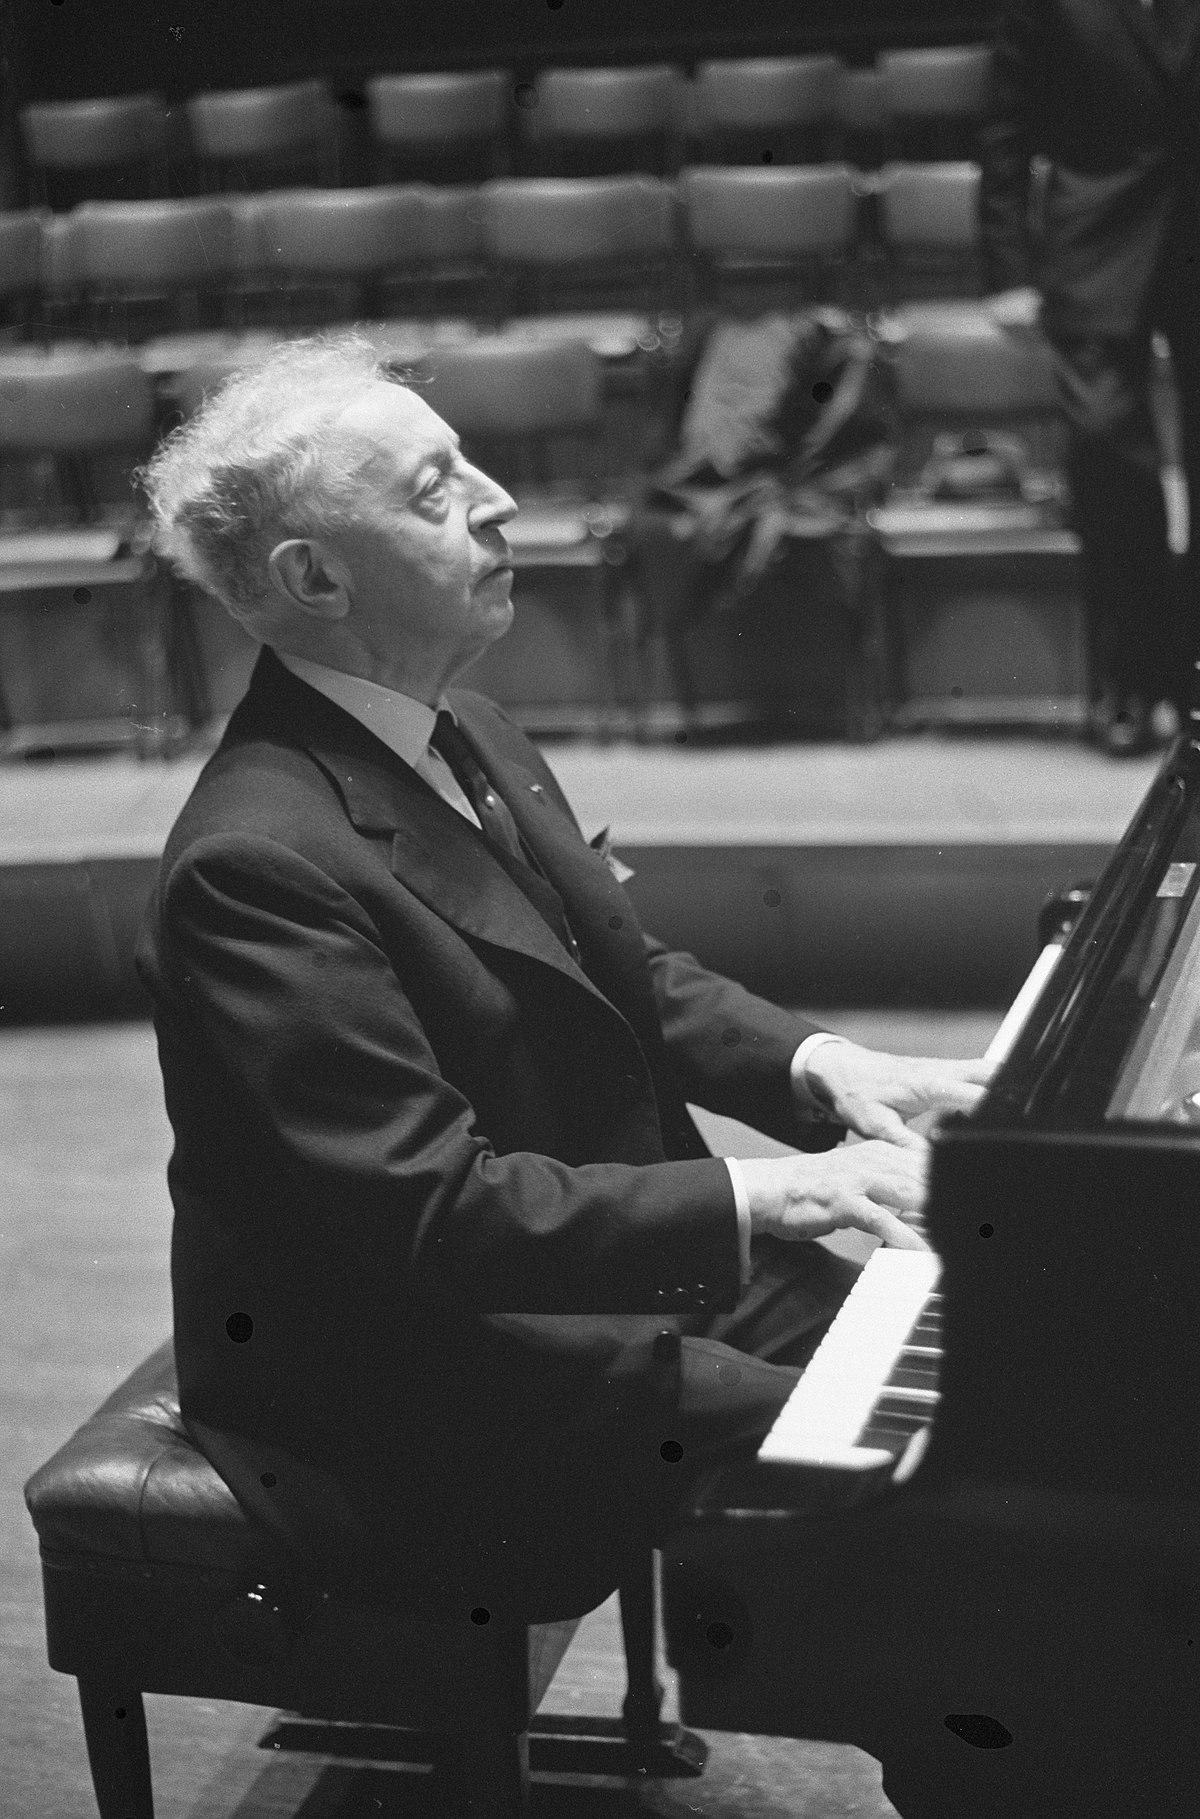 1200px-Optreden_Arthur_Rubinstein_in_Concertgebouw%2C_Bestanddeelnr_913-5228.jpg